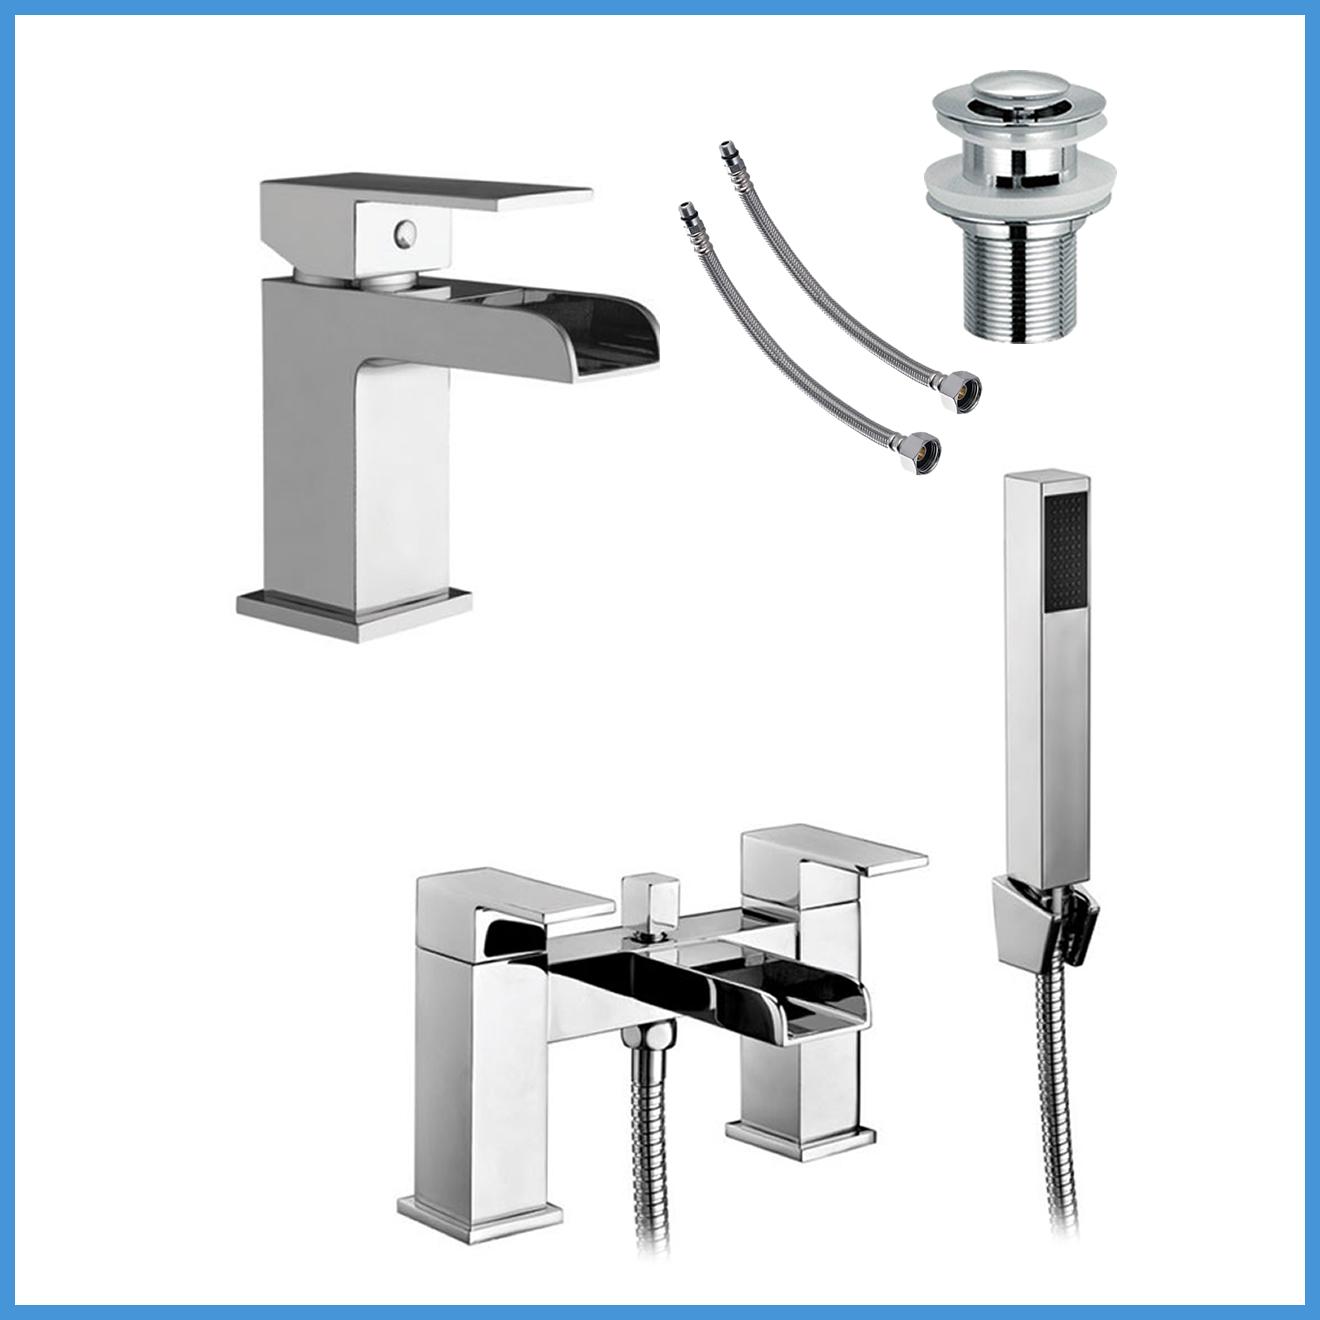 waterfall bath taps bath filler shower mixer tap bathroom set ebay